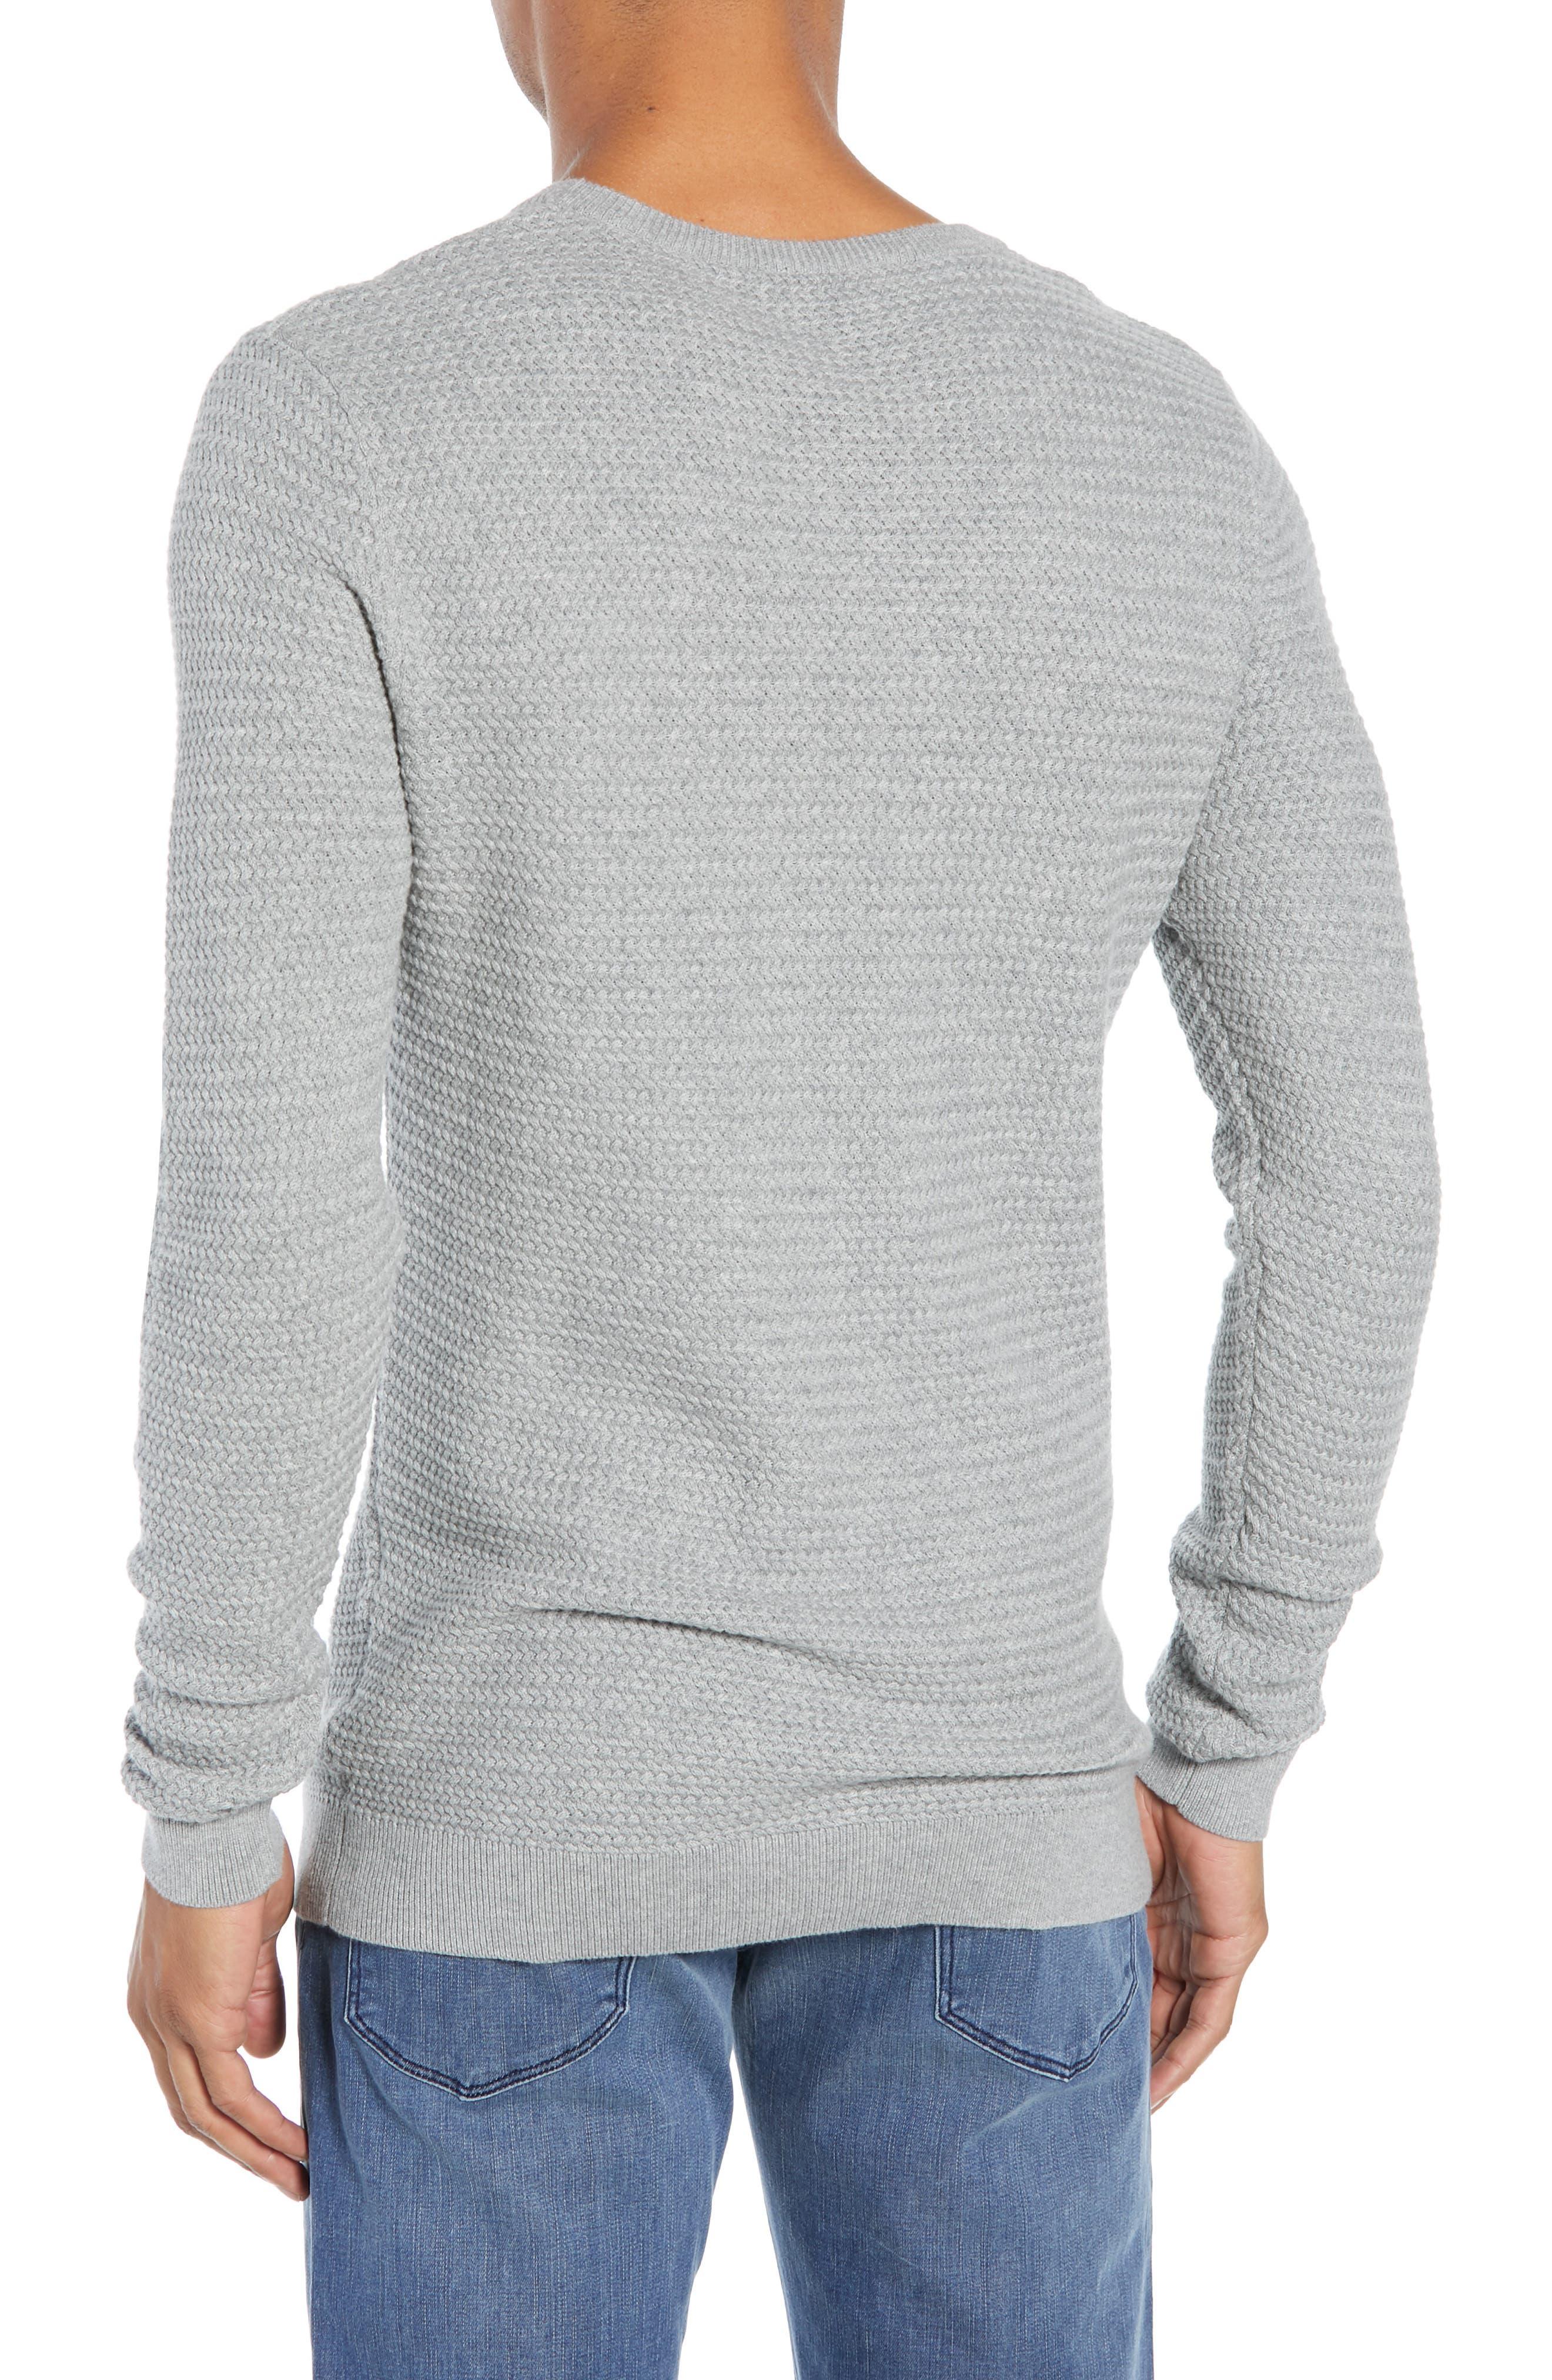 Martin Regular Fit Crewneck Sweater,                             Alternate thumbnail 2, color,                             MEDIUM GREY